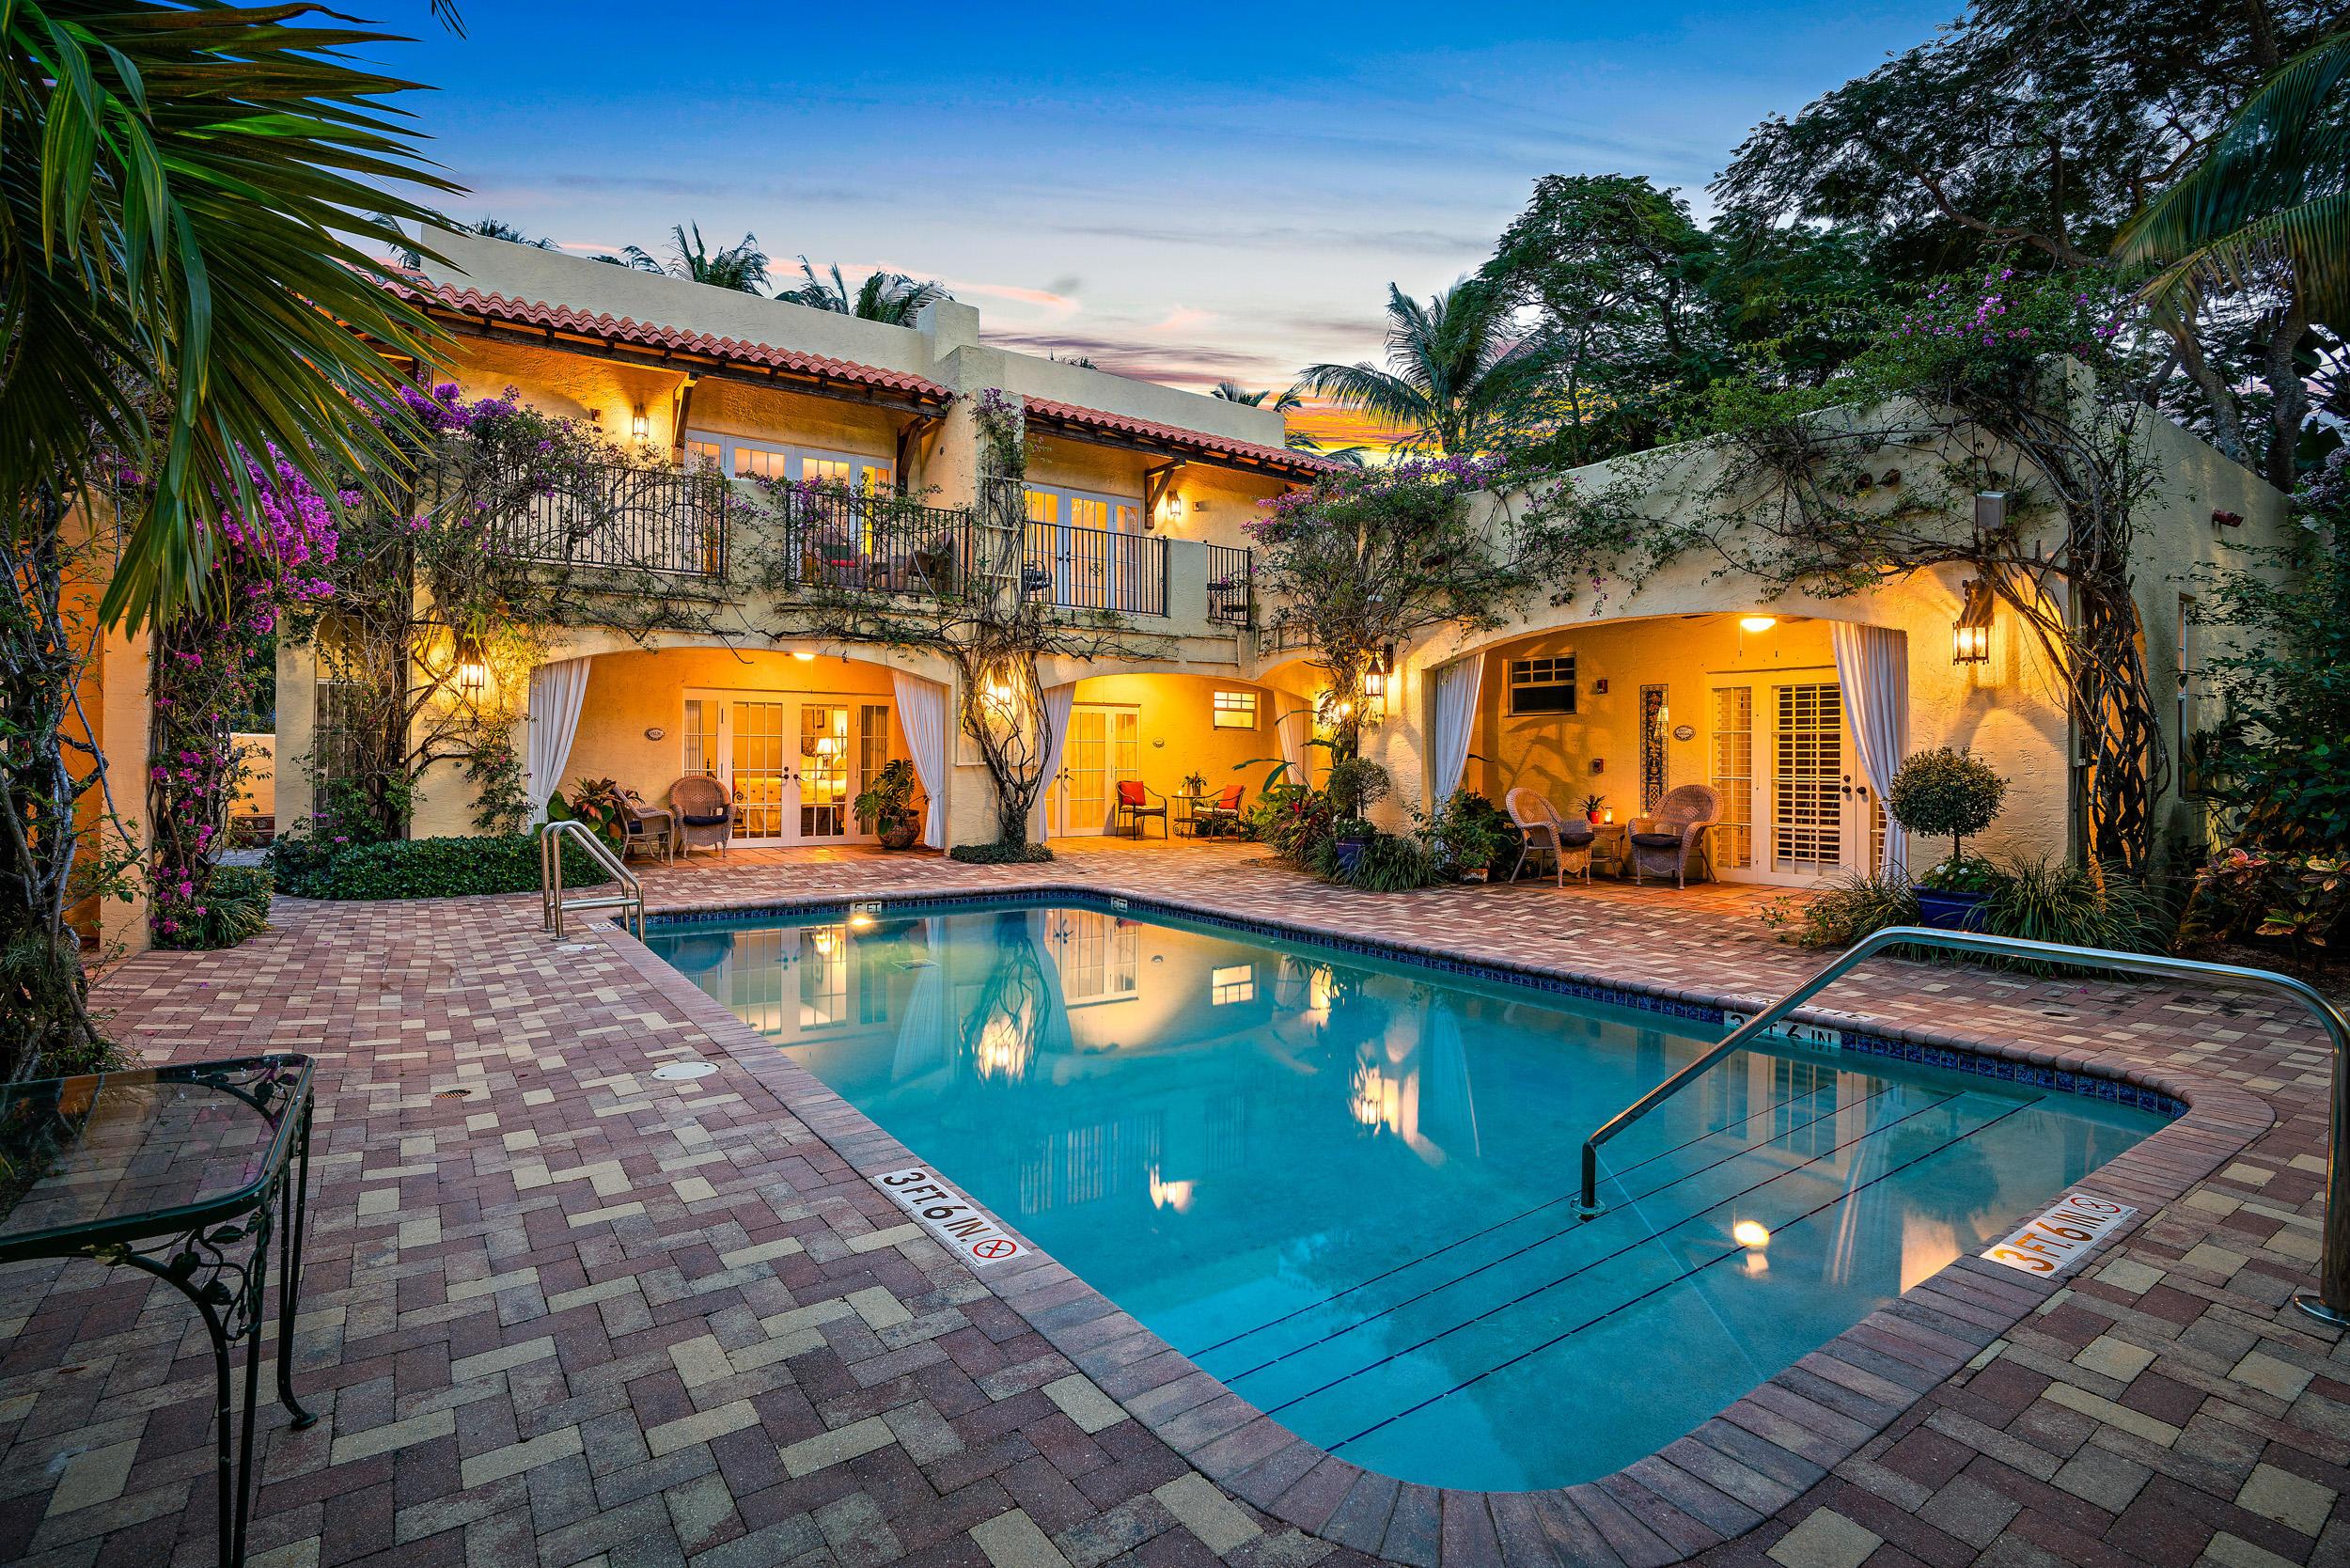 1608 Lake, West Palm Beach, Florida 33401